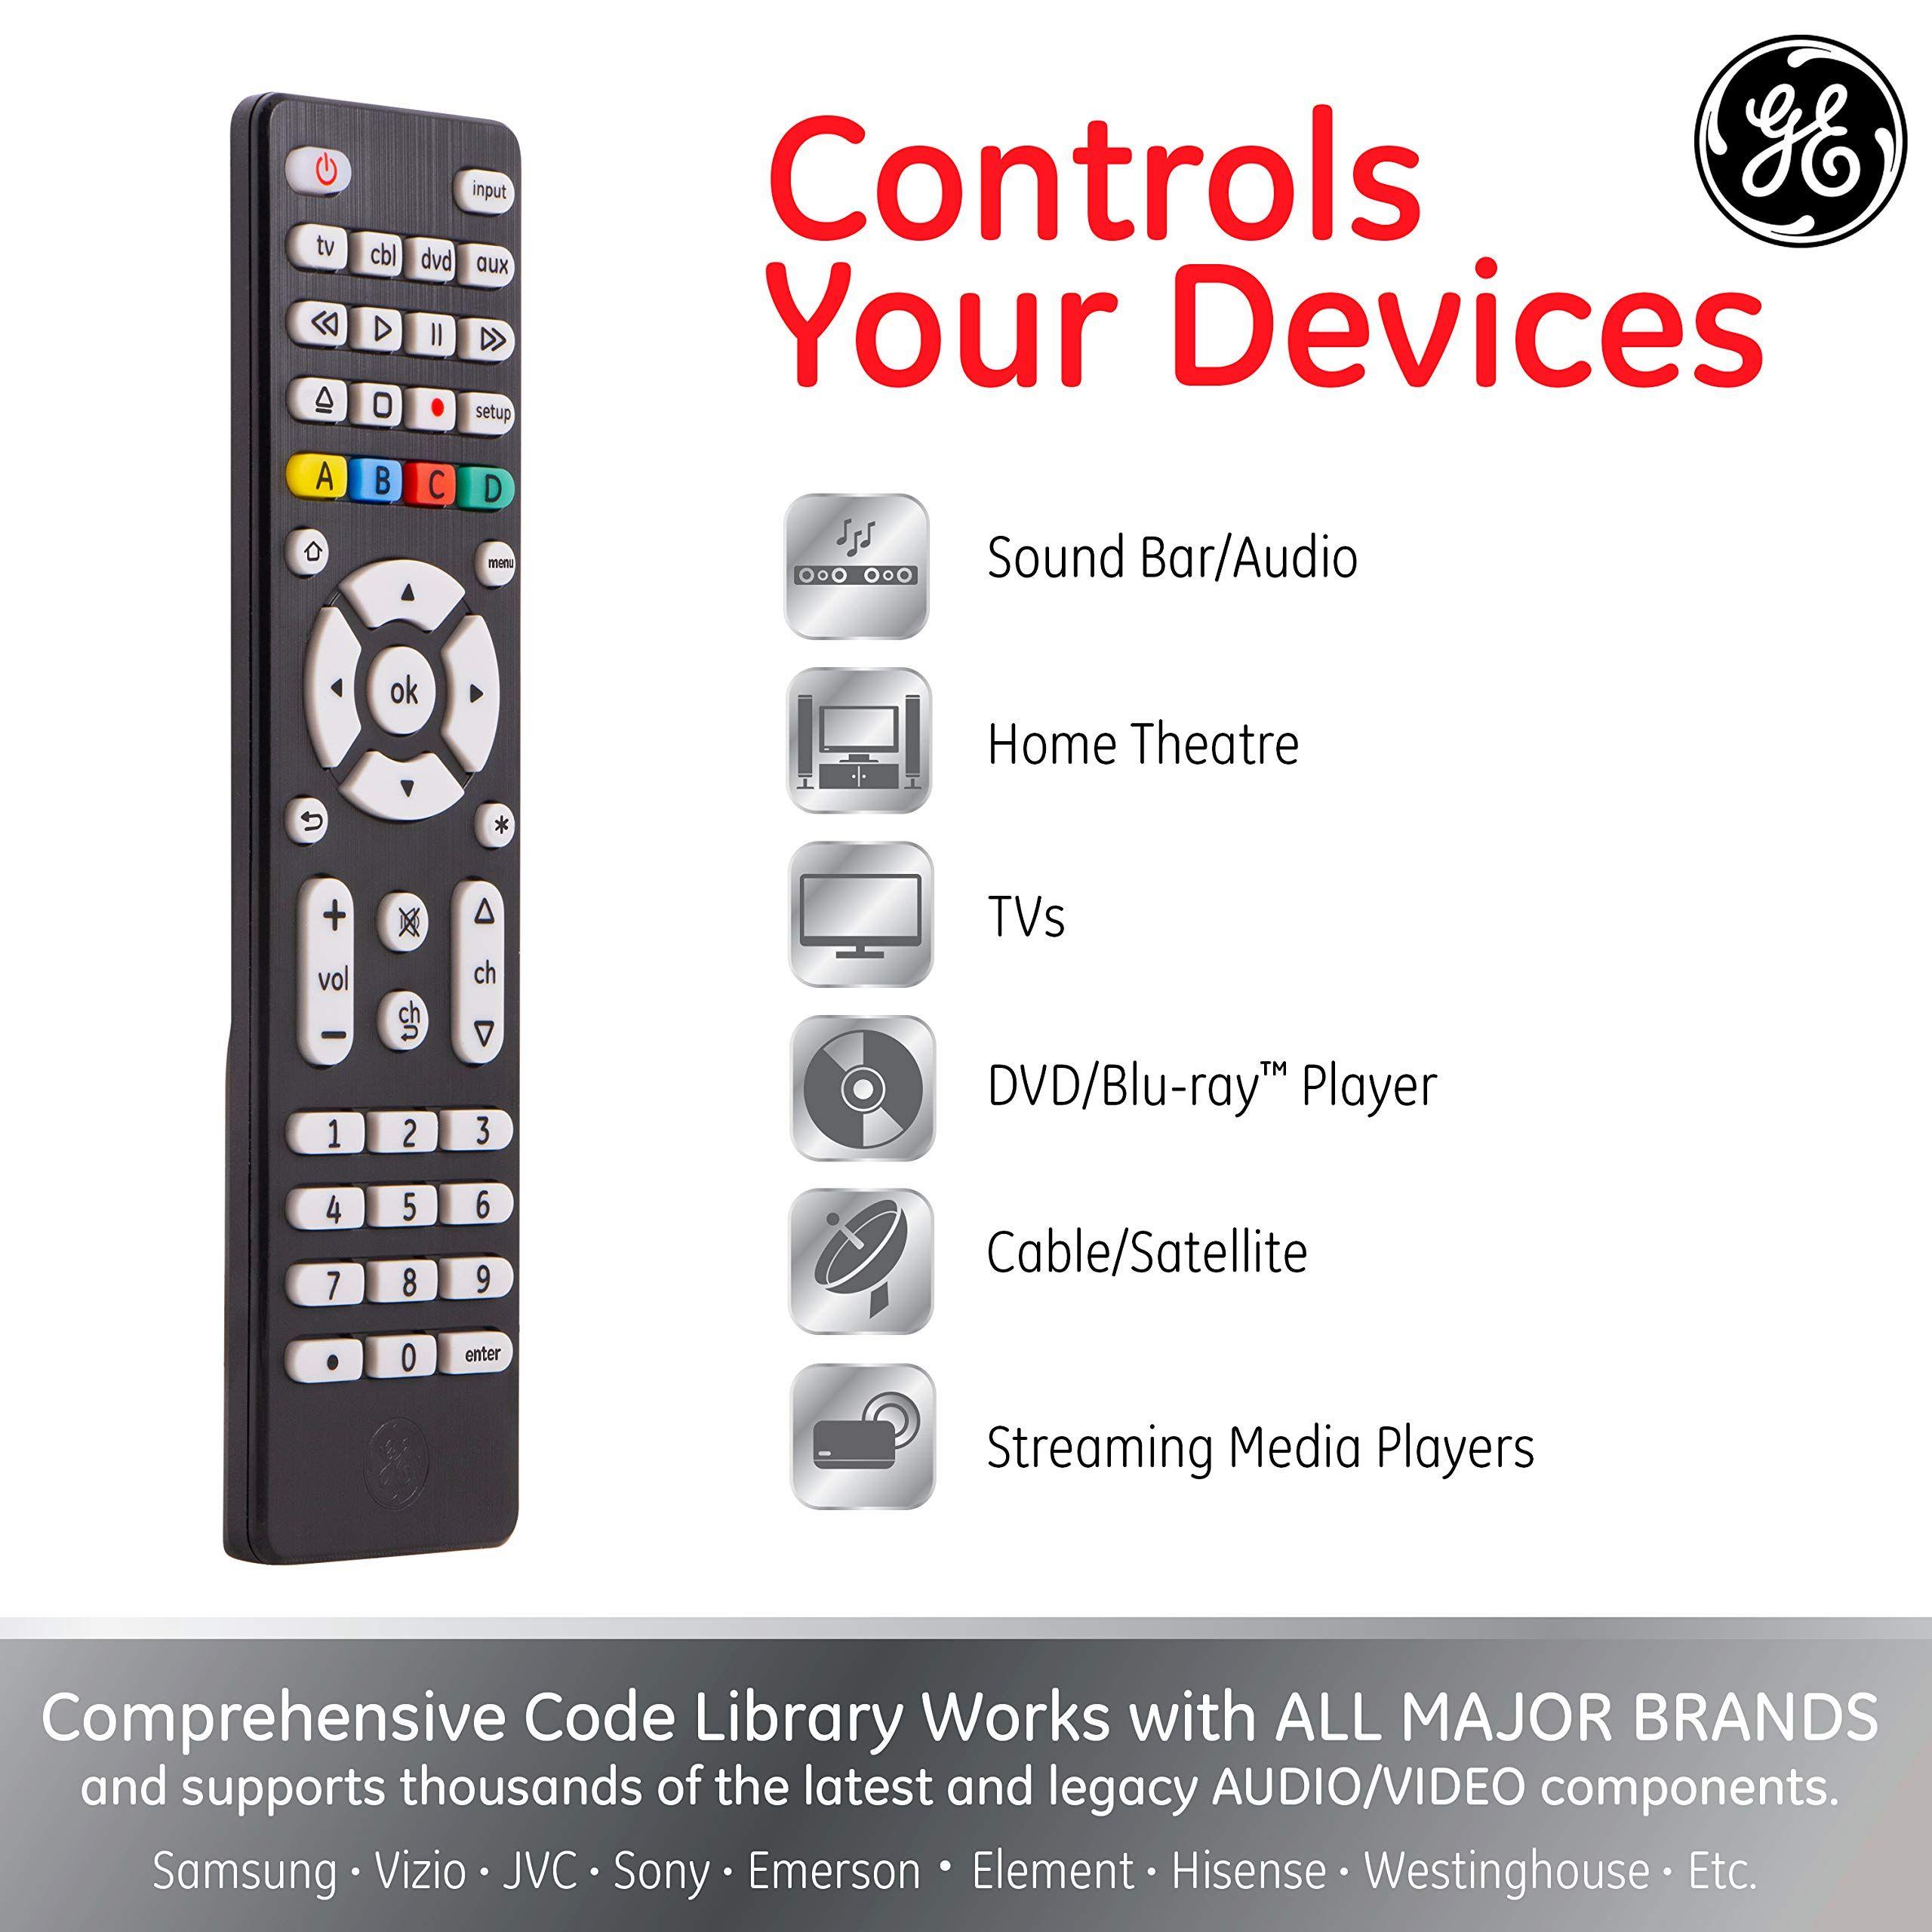 Ge 4 Device Universal Remote Works With Smart Tvs Lg Vizio Sony